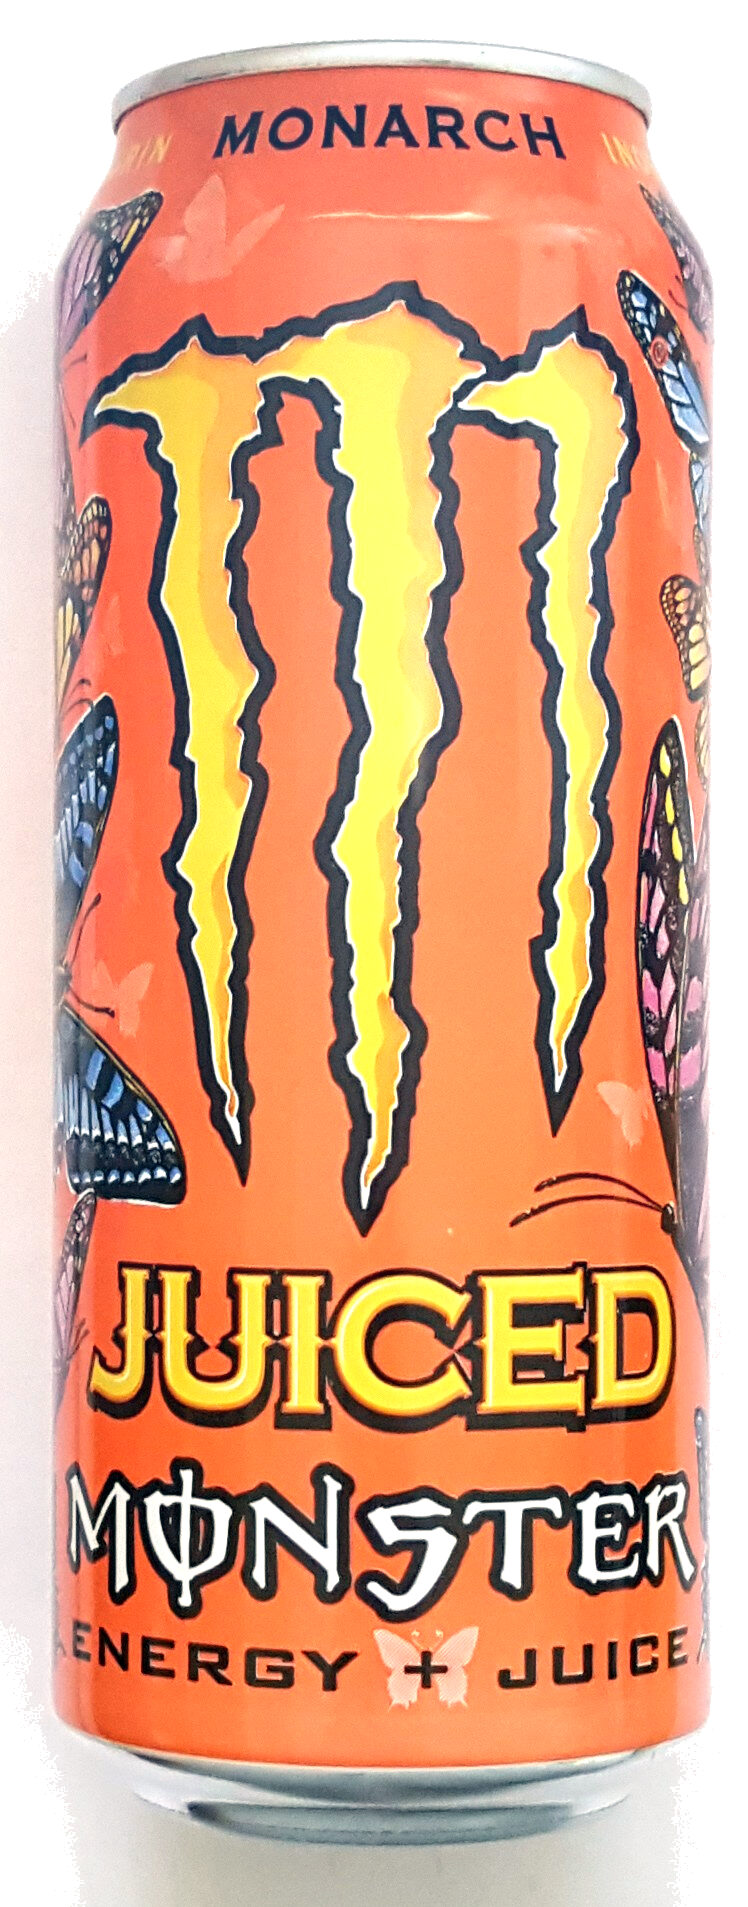 Juiced Monster Monarch Energy + Juice - Prodotto - sv